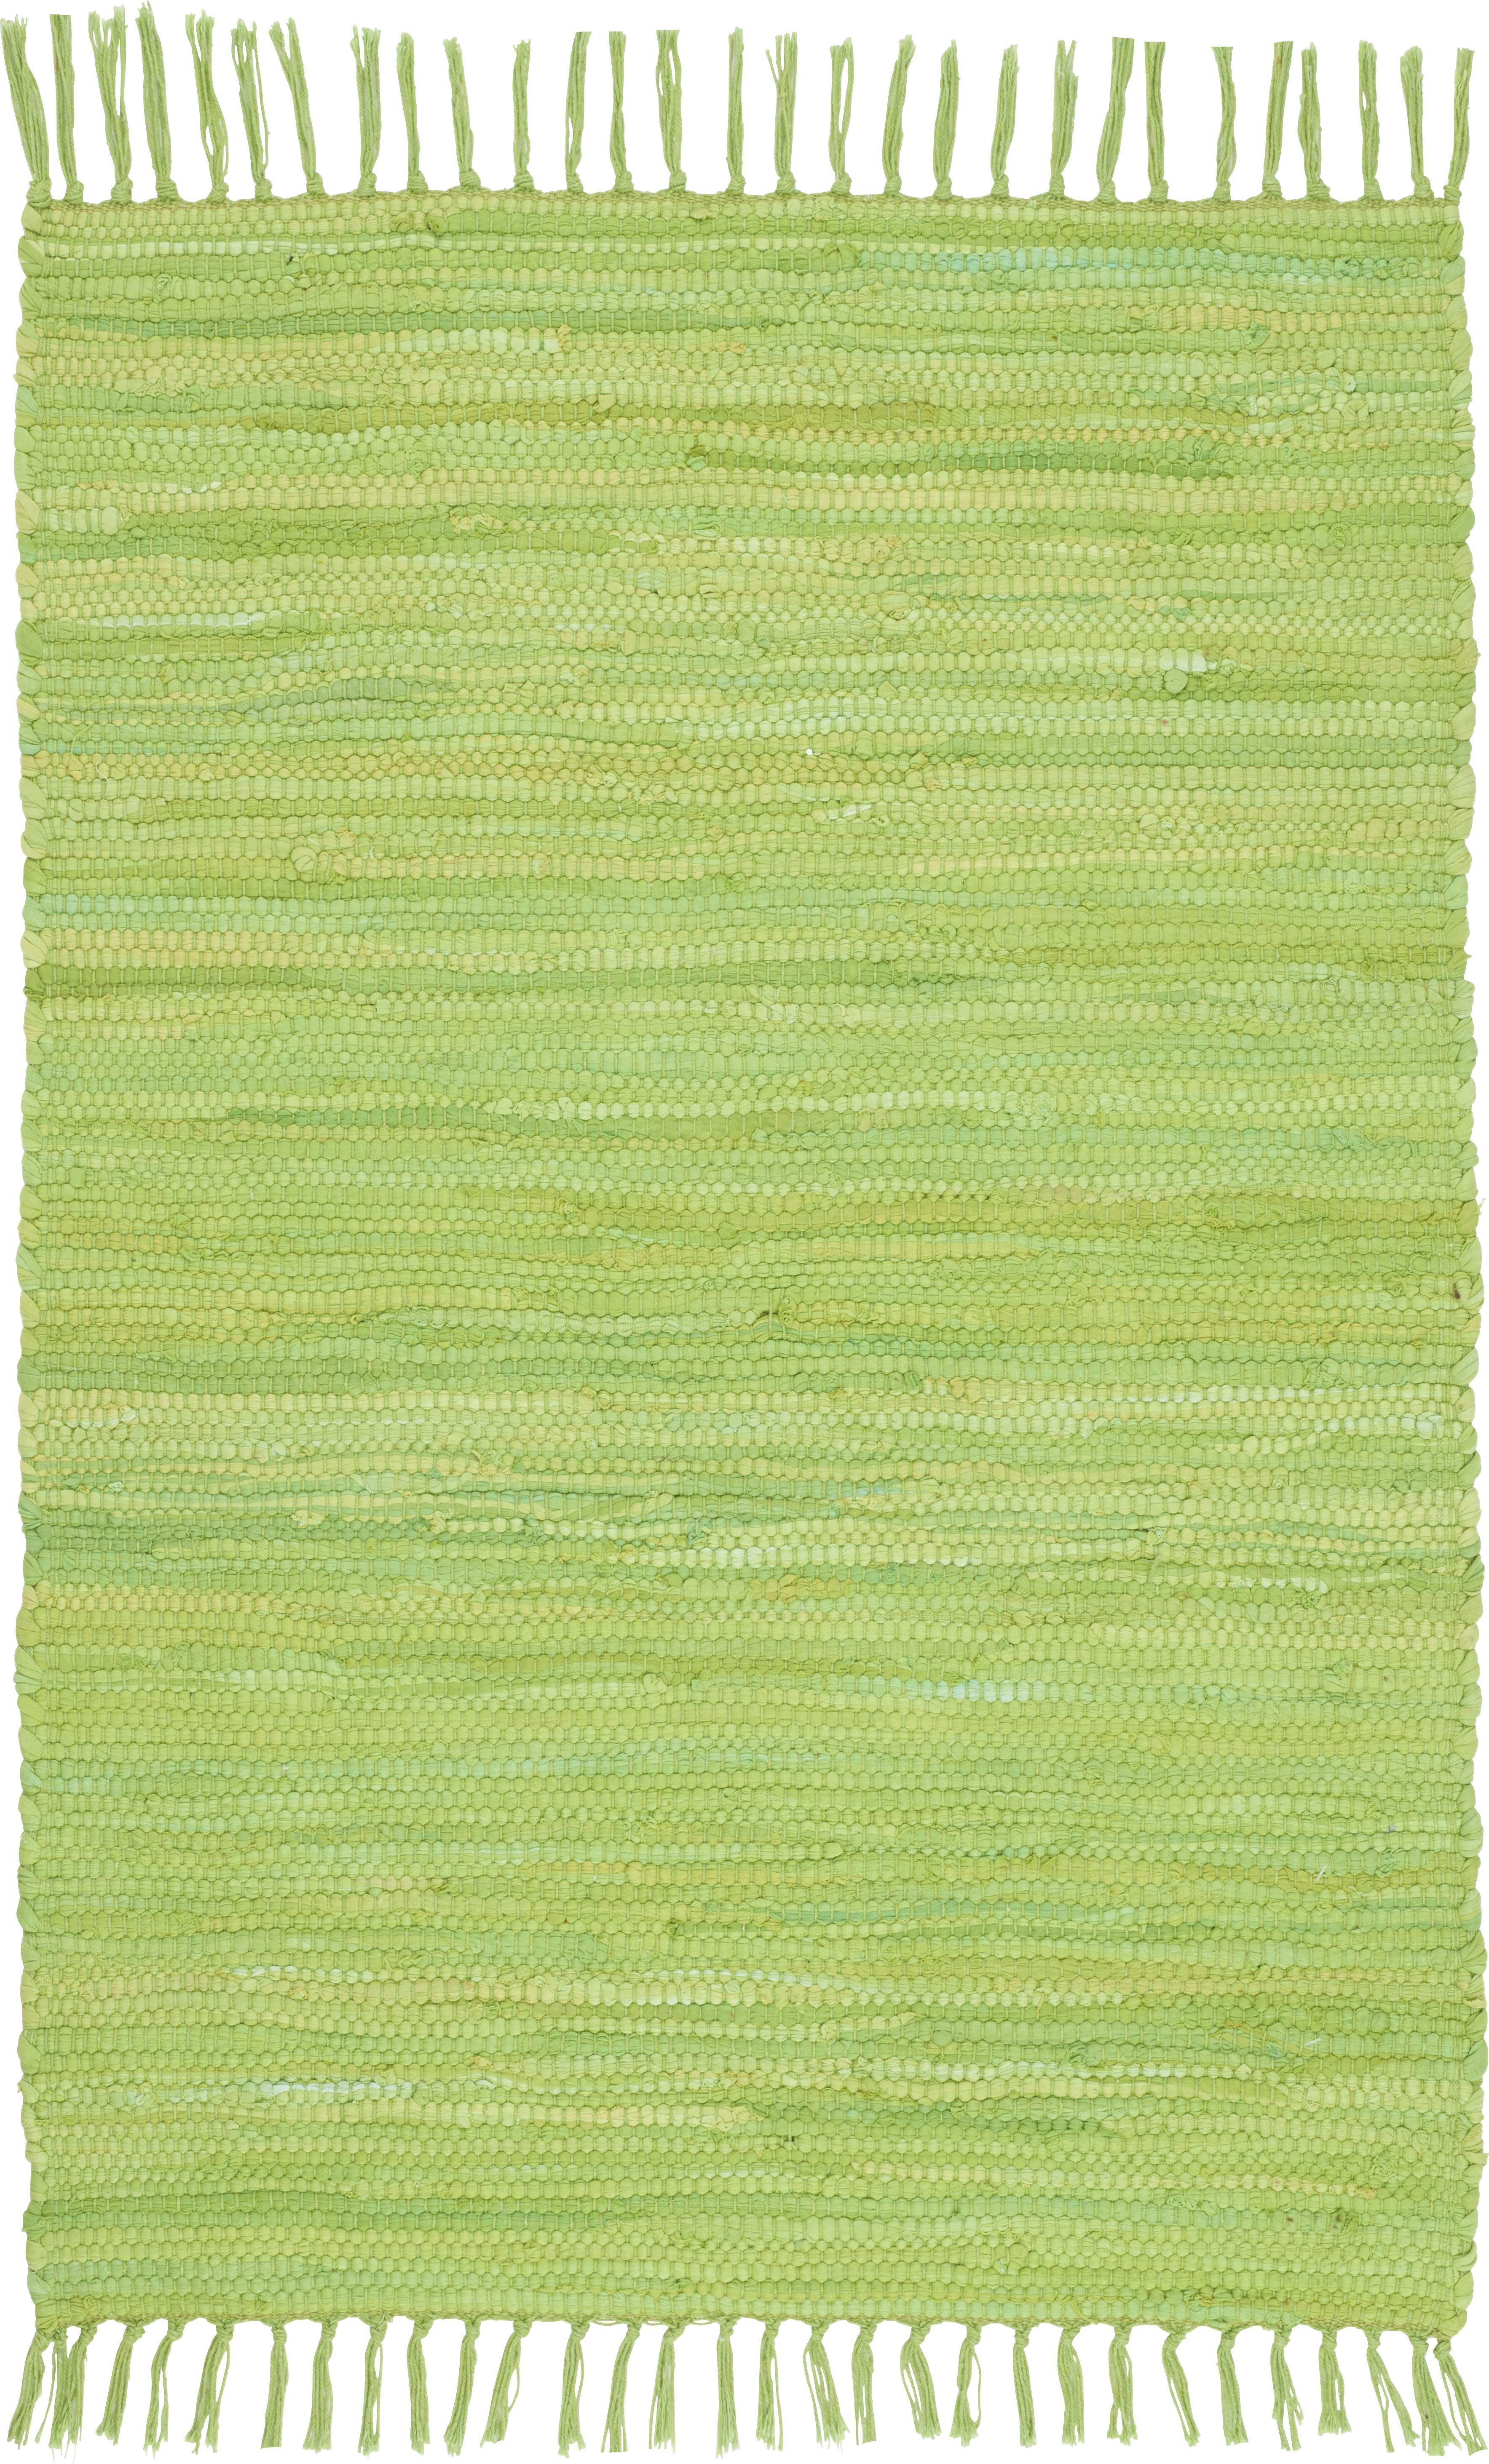 Fleckerlteppich Julia - Hellgrün, KONVENTIONELL, Textil (60/90cm) - MÖMAX modern living